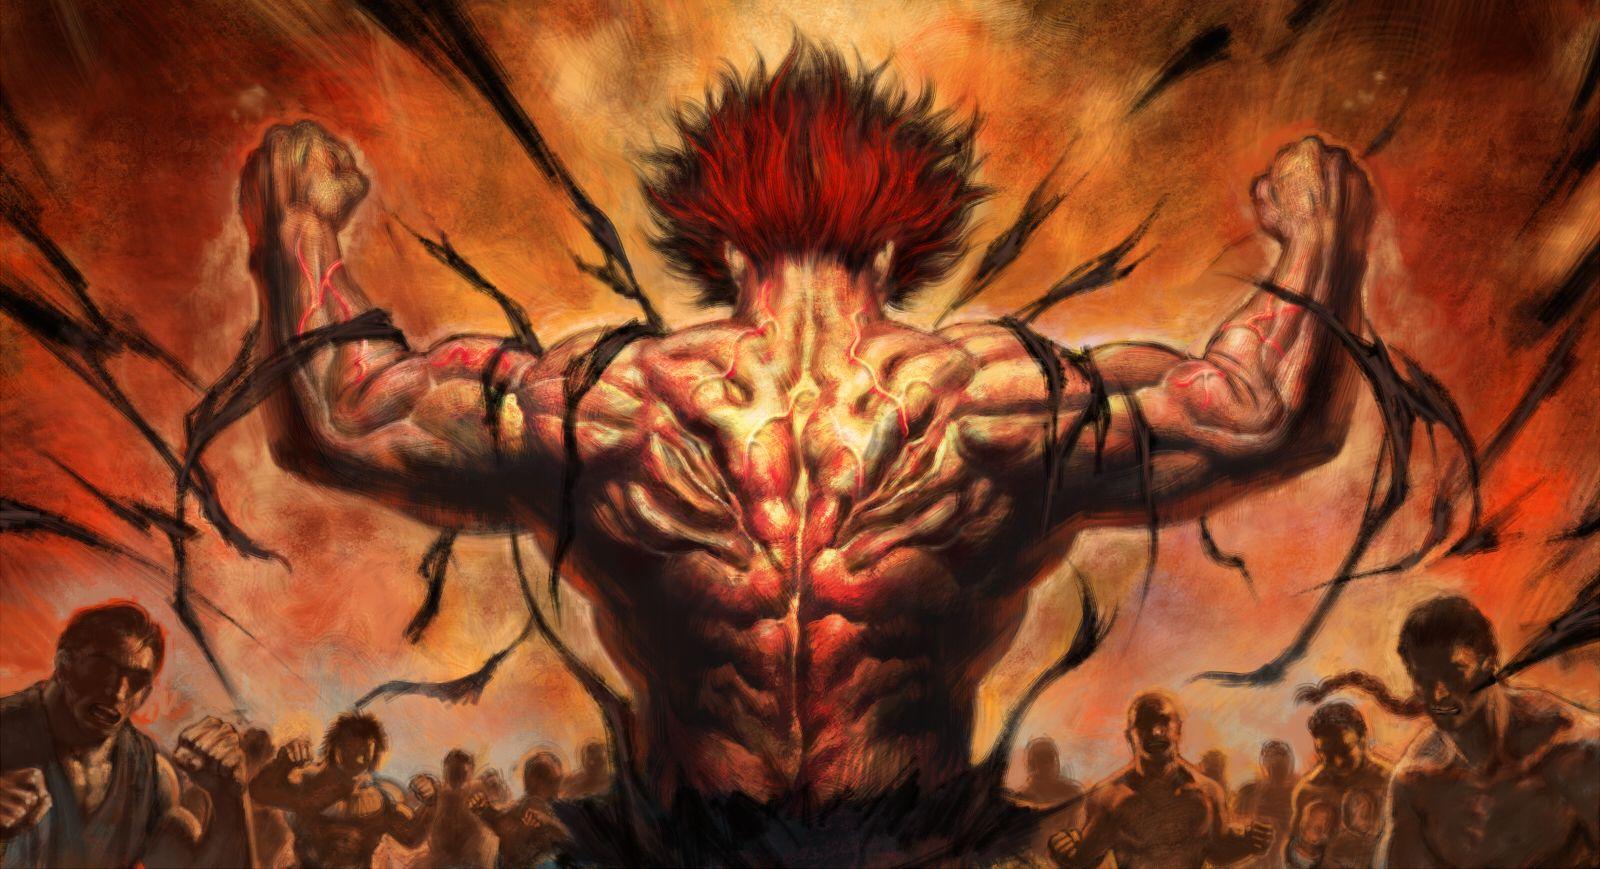 yujiro hanma otherwise known as the fighting god satan cartoons